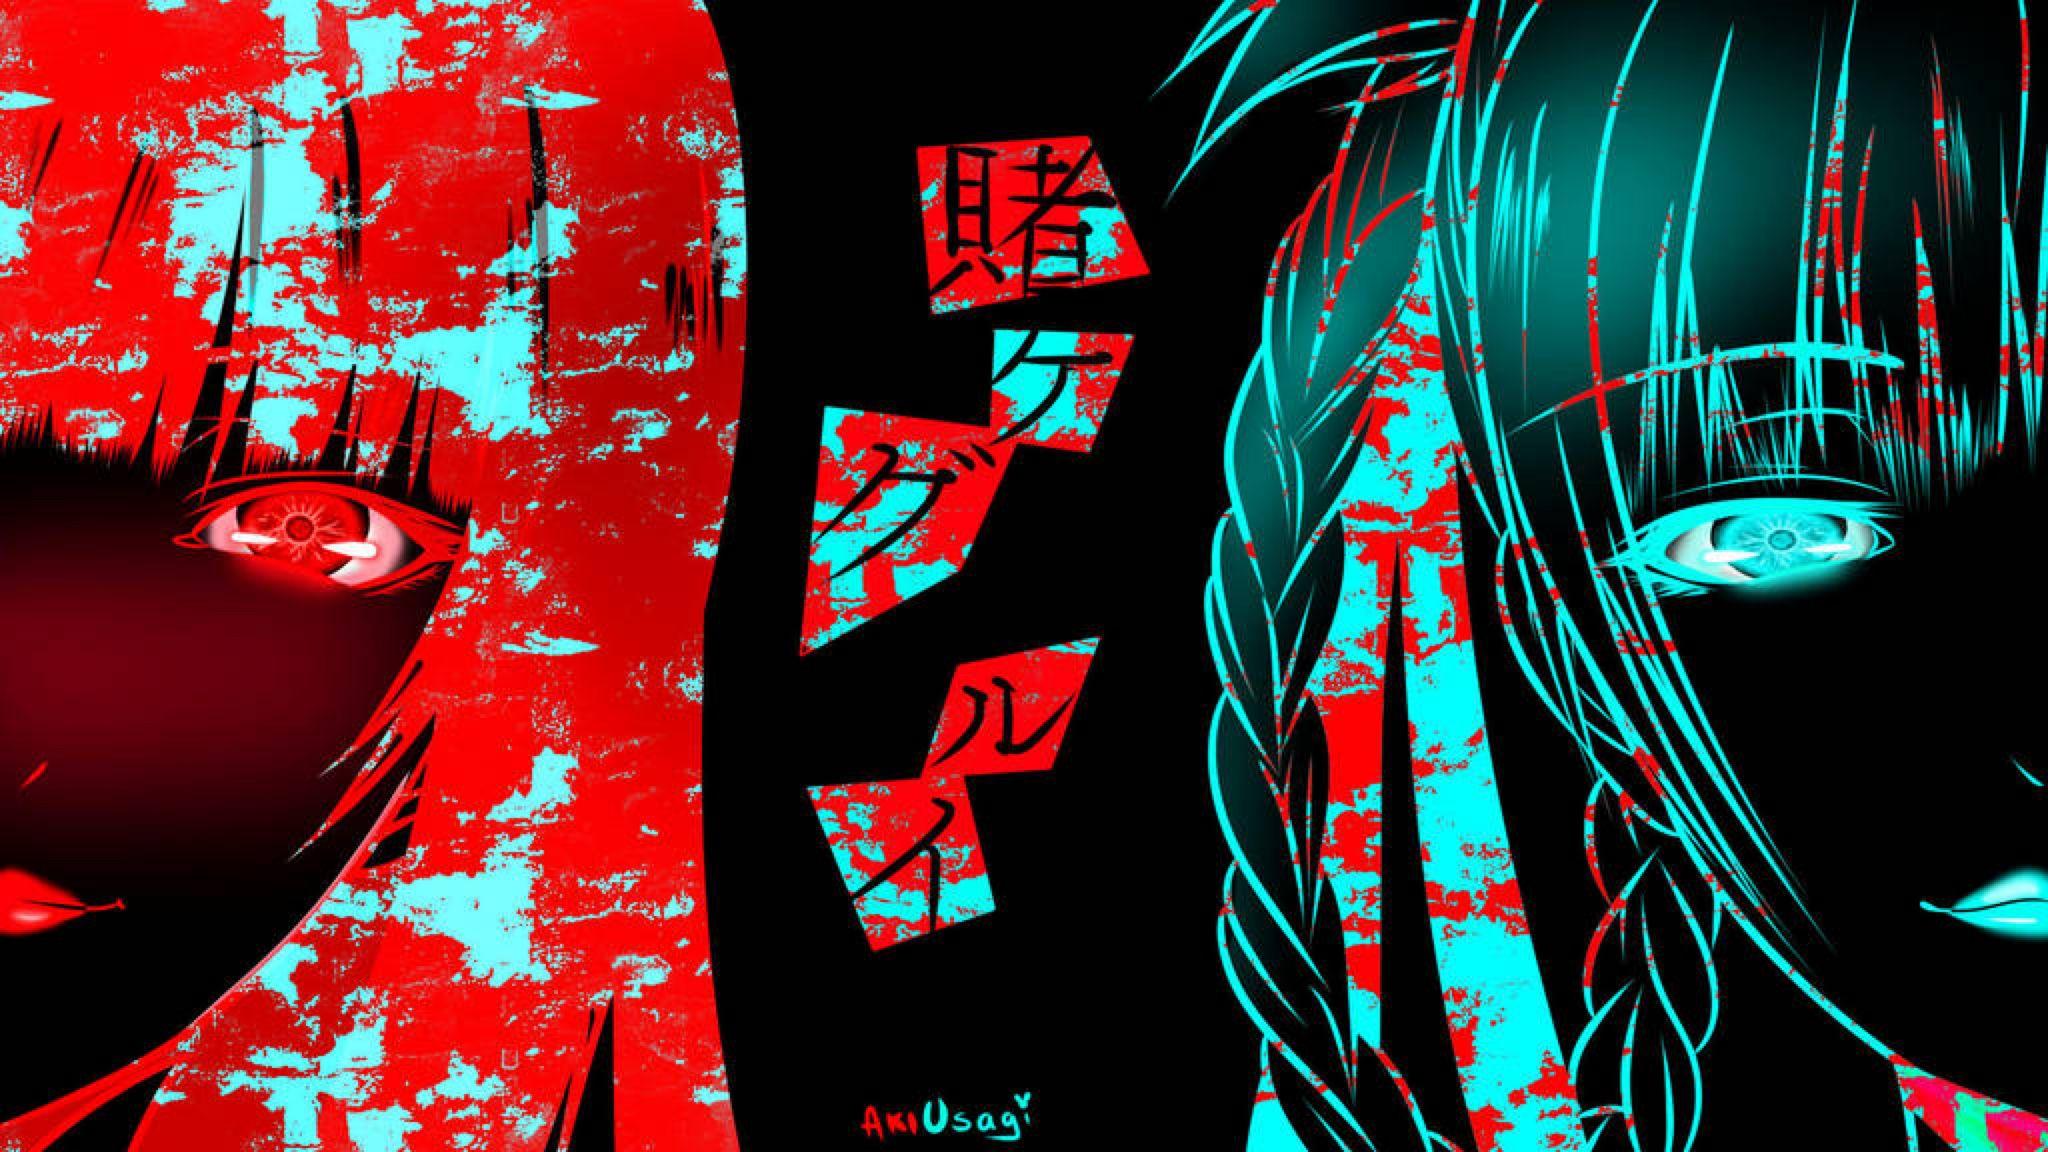 Kakegurui By Aki52usagi On Deviantart Anime Wallpaper Wallpaper Ipad Wallpaper